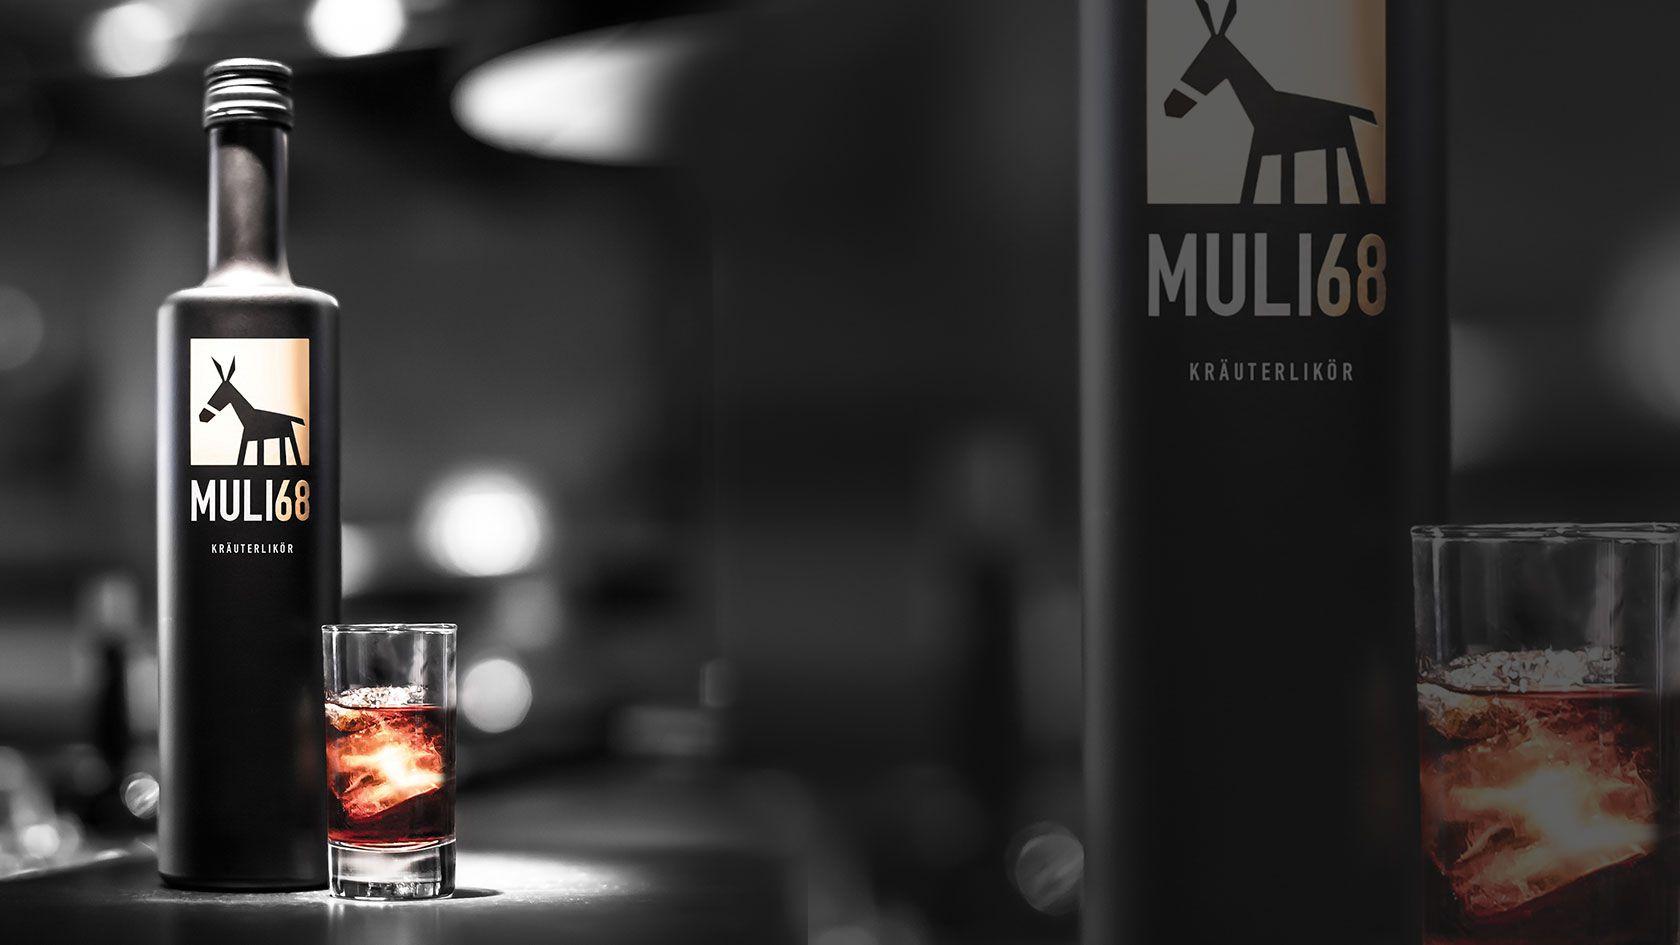 Muli 68 Getränke GmbH